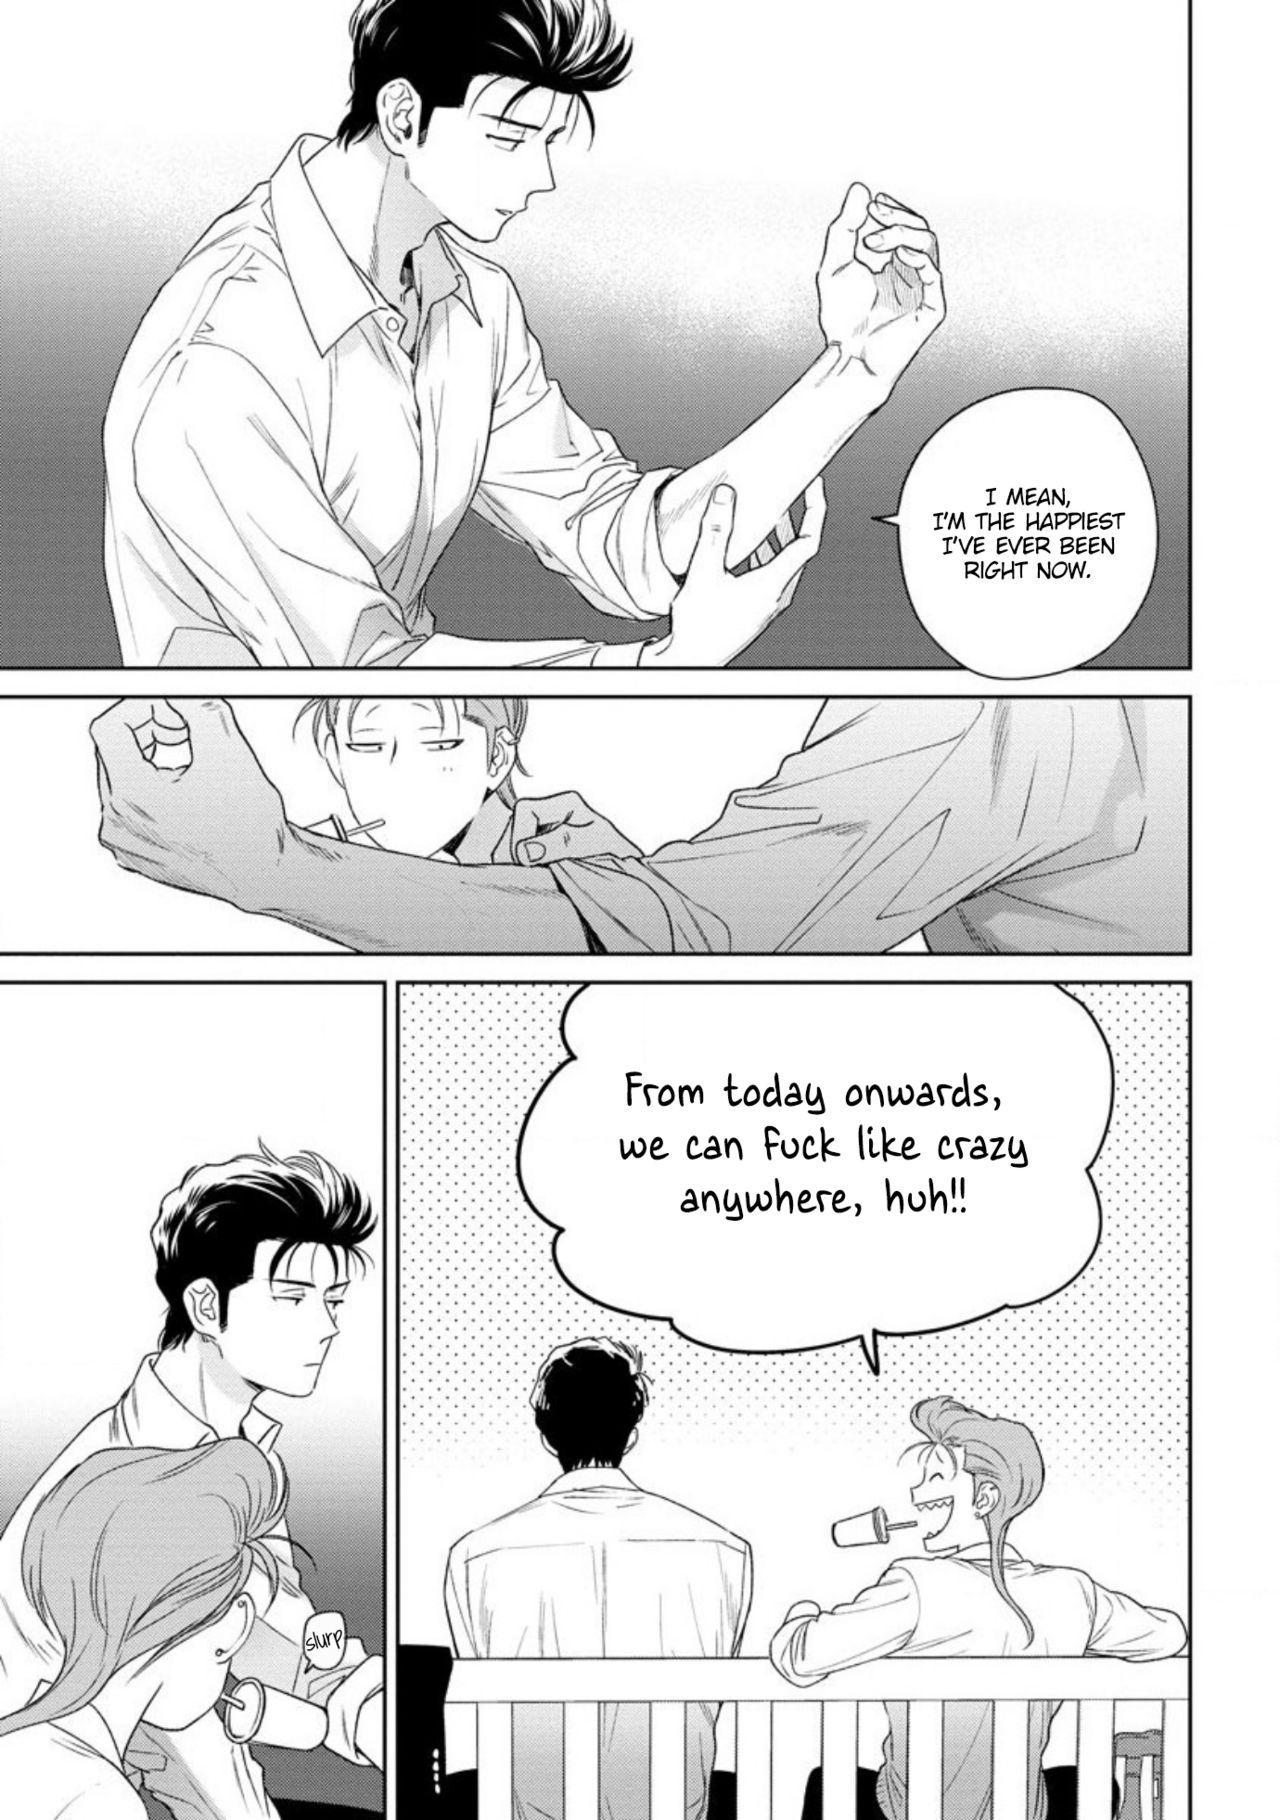 [Hiiragi Nozomu] Nakasete Yaru yo Yankee-kun   I'll Make You Cry Ch. 1-5 + Extras [English] [Digital] 187